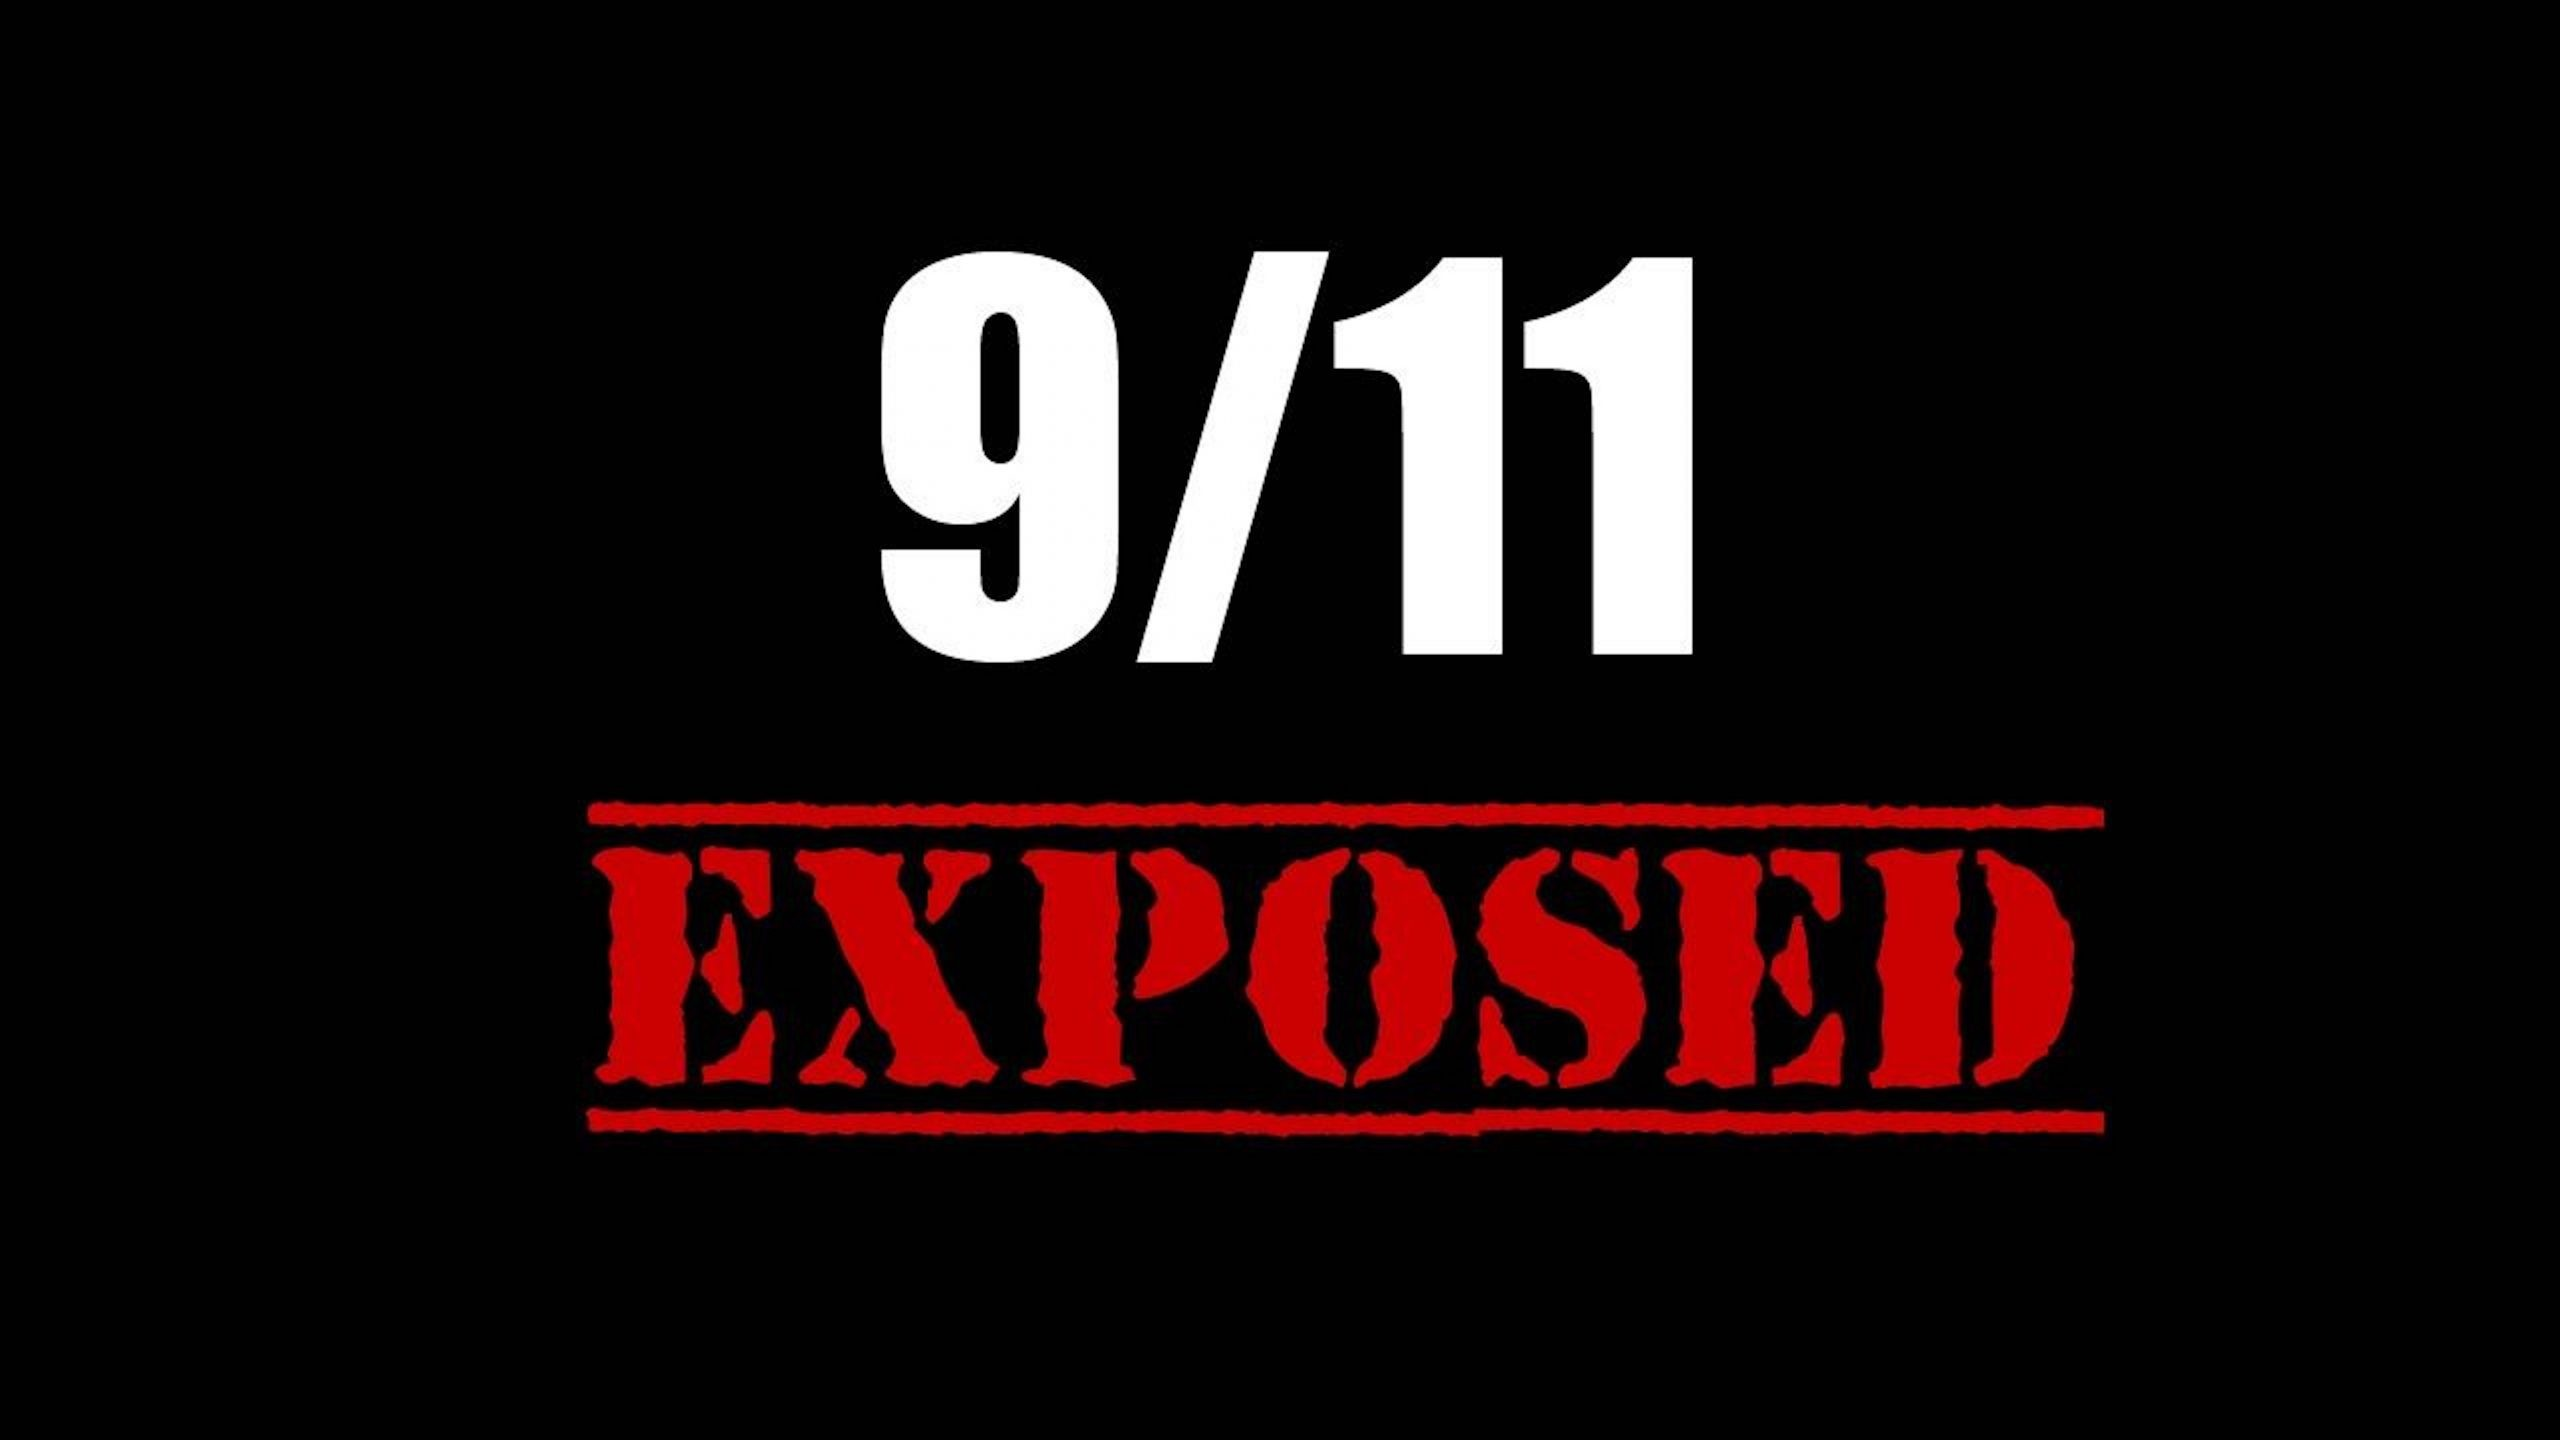 9/11 Exposed (foto Pinterest)